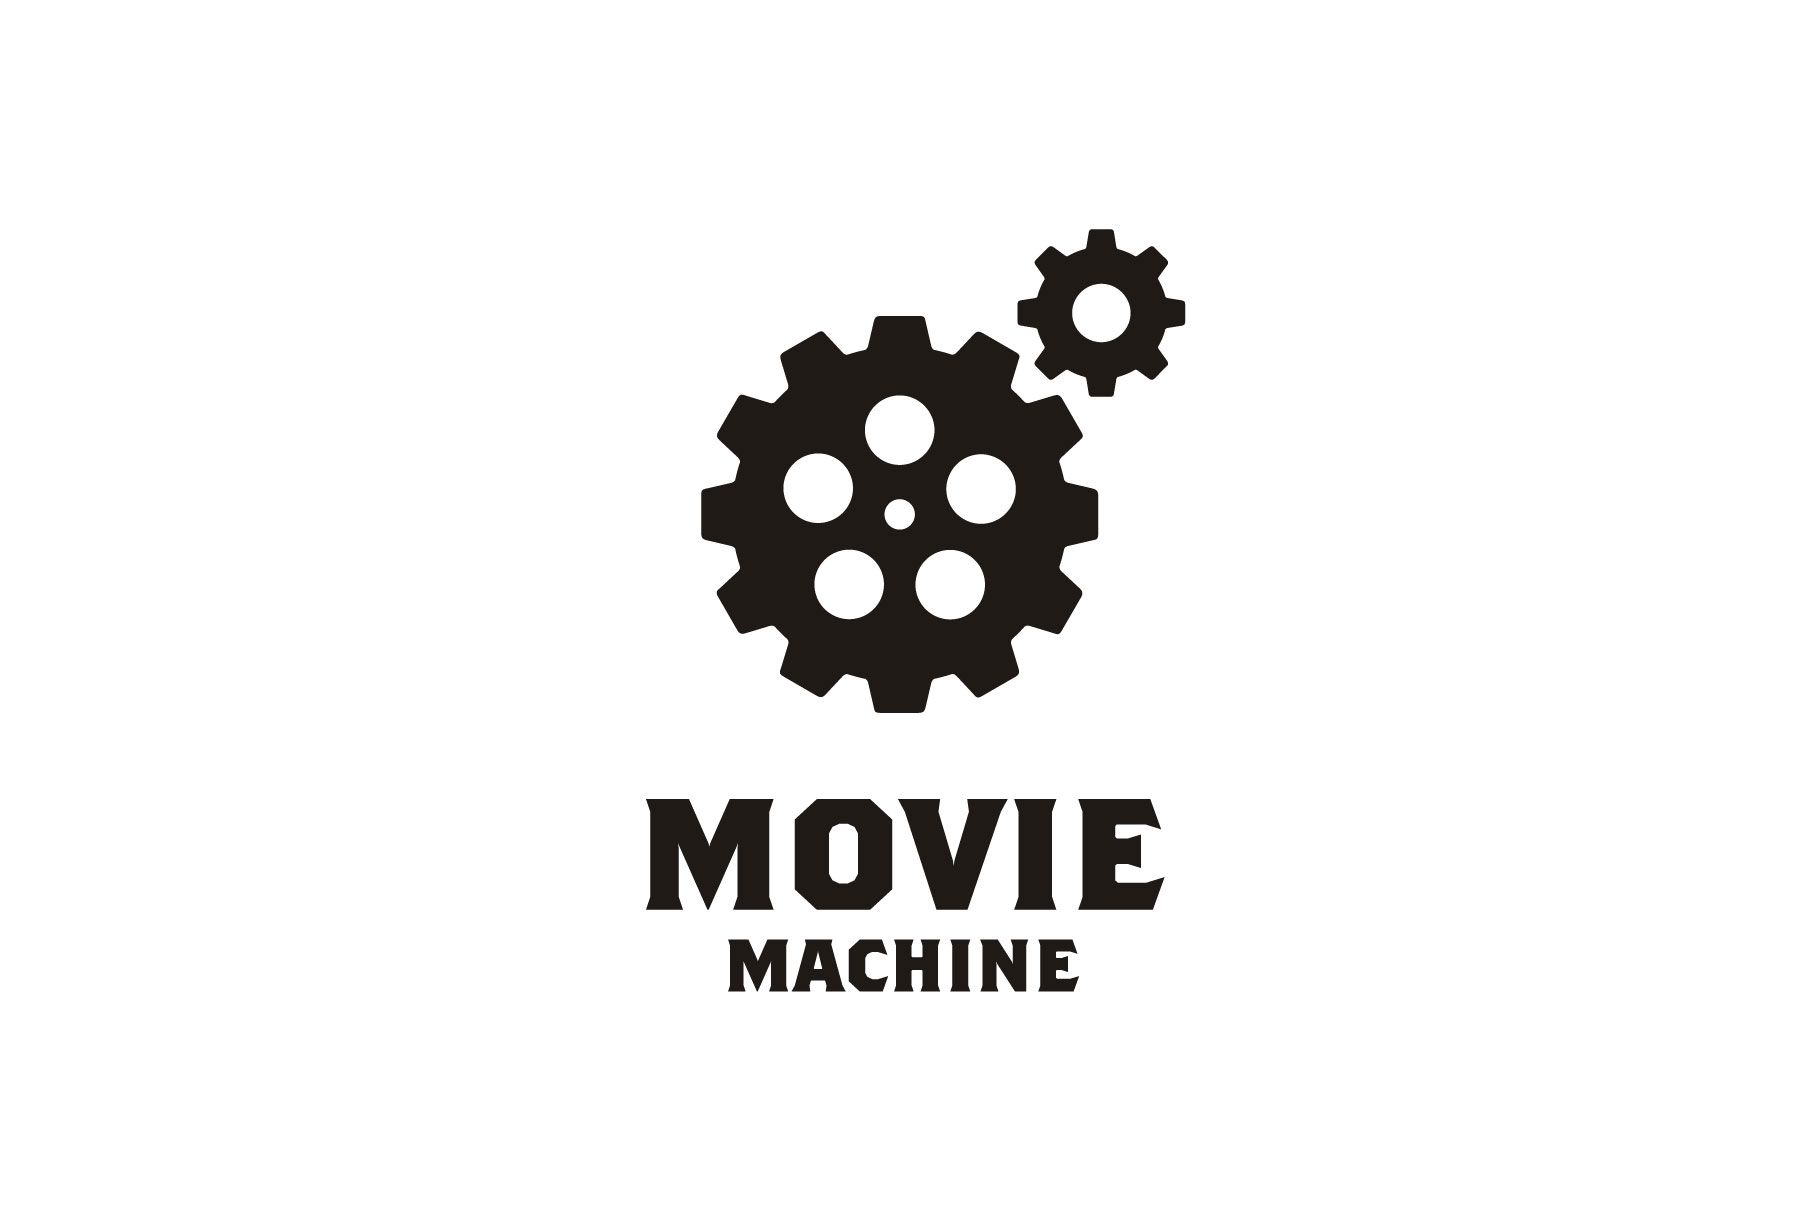 Film Reel Gears Movie Cinema Film Logo Graphic By Enola99d Creative Fabrica Film Logo Cinema Film Cinema